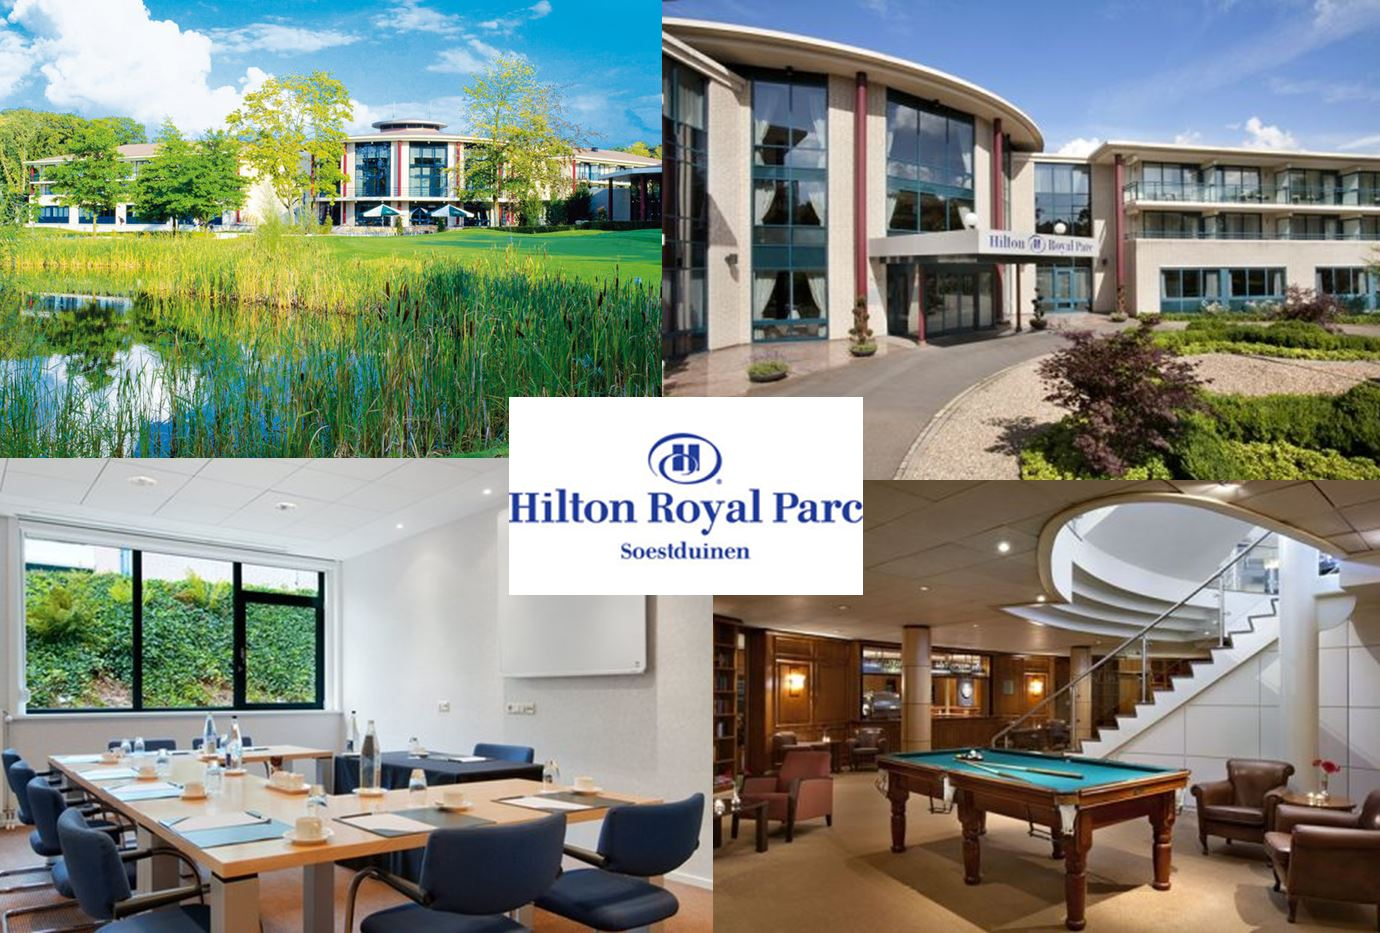 Hilton Royal Parc Soestduinen Alwin Zandvoort